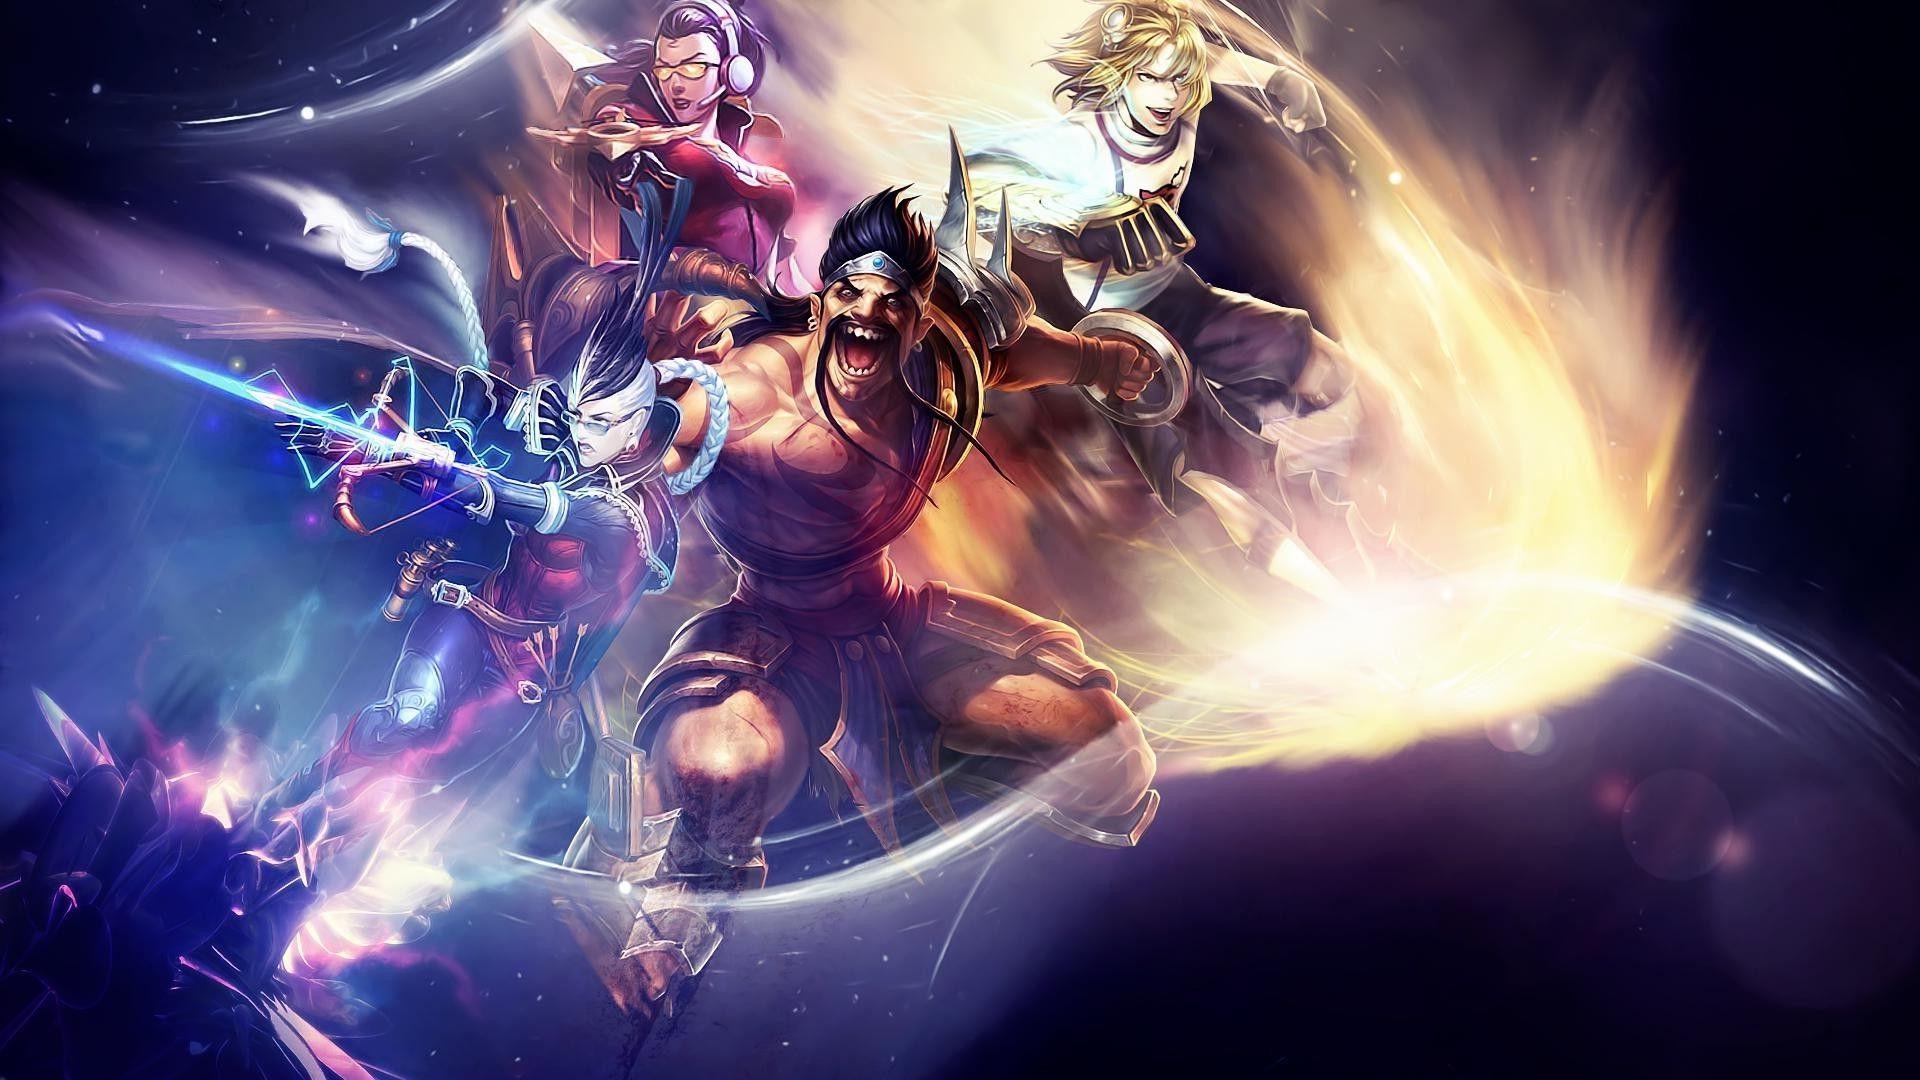 League Of Legends, Draven, Vayne, Ezreal Wallpapers HD / Desktop ...